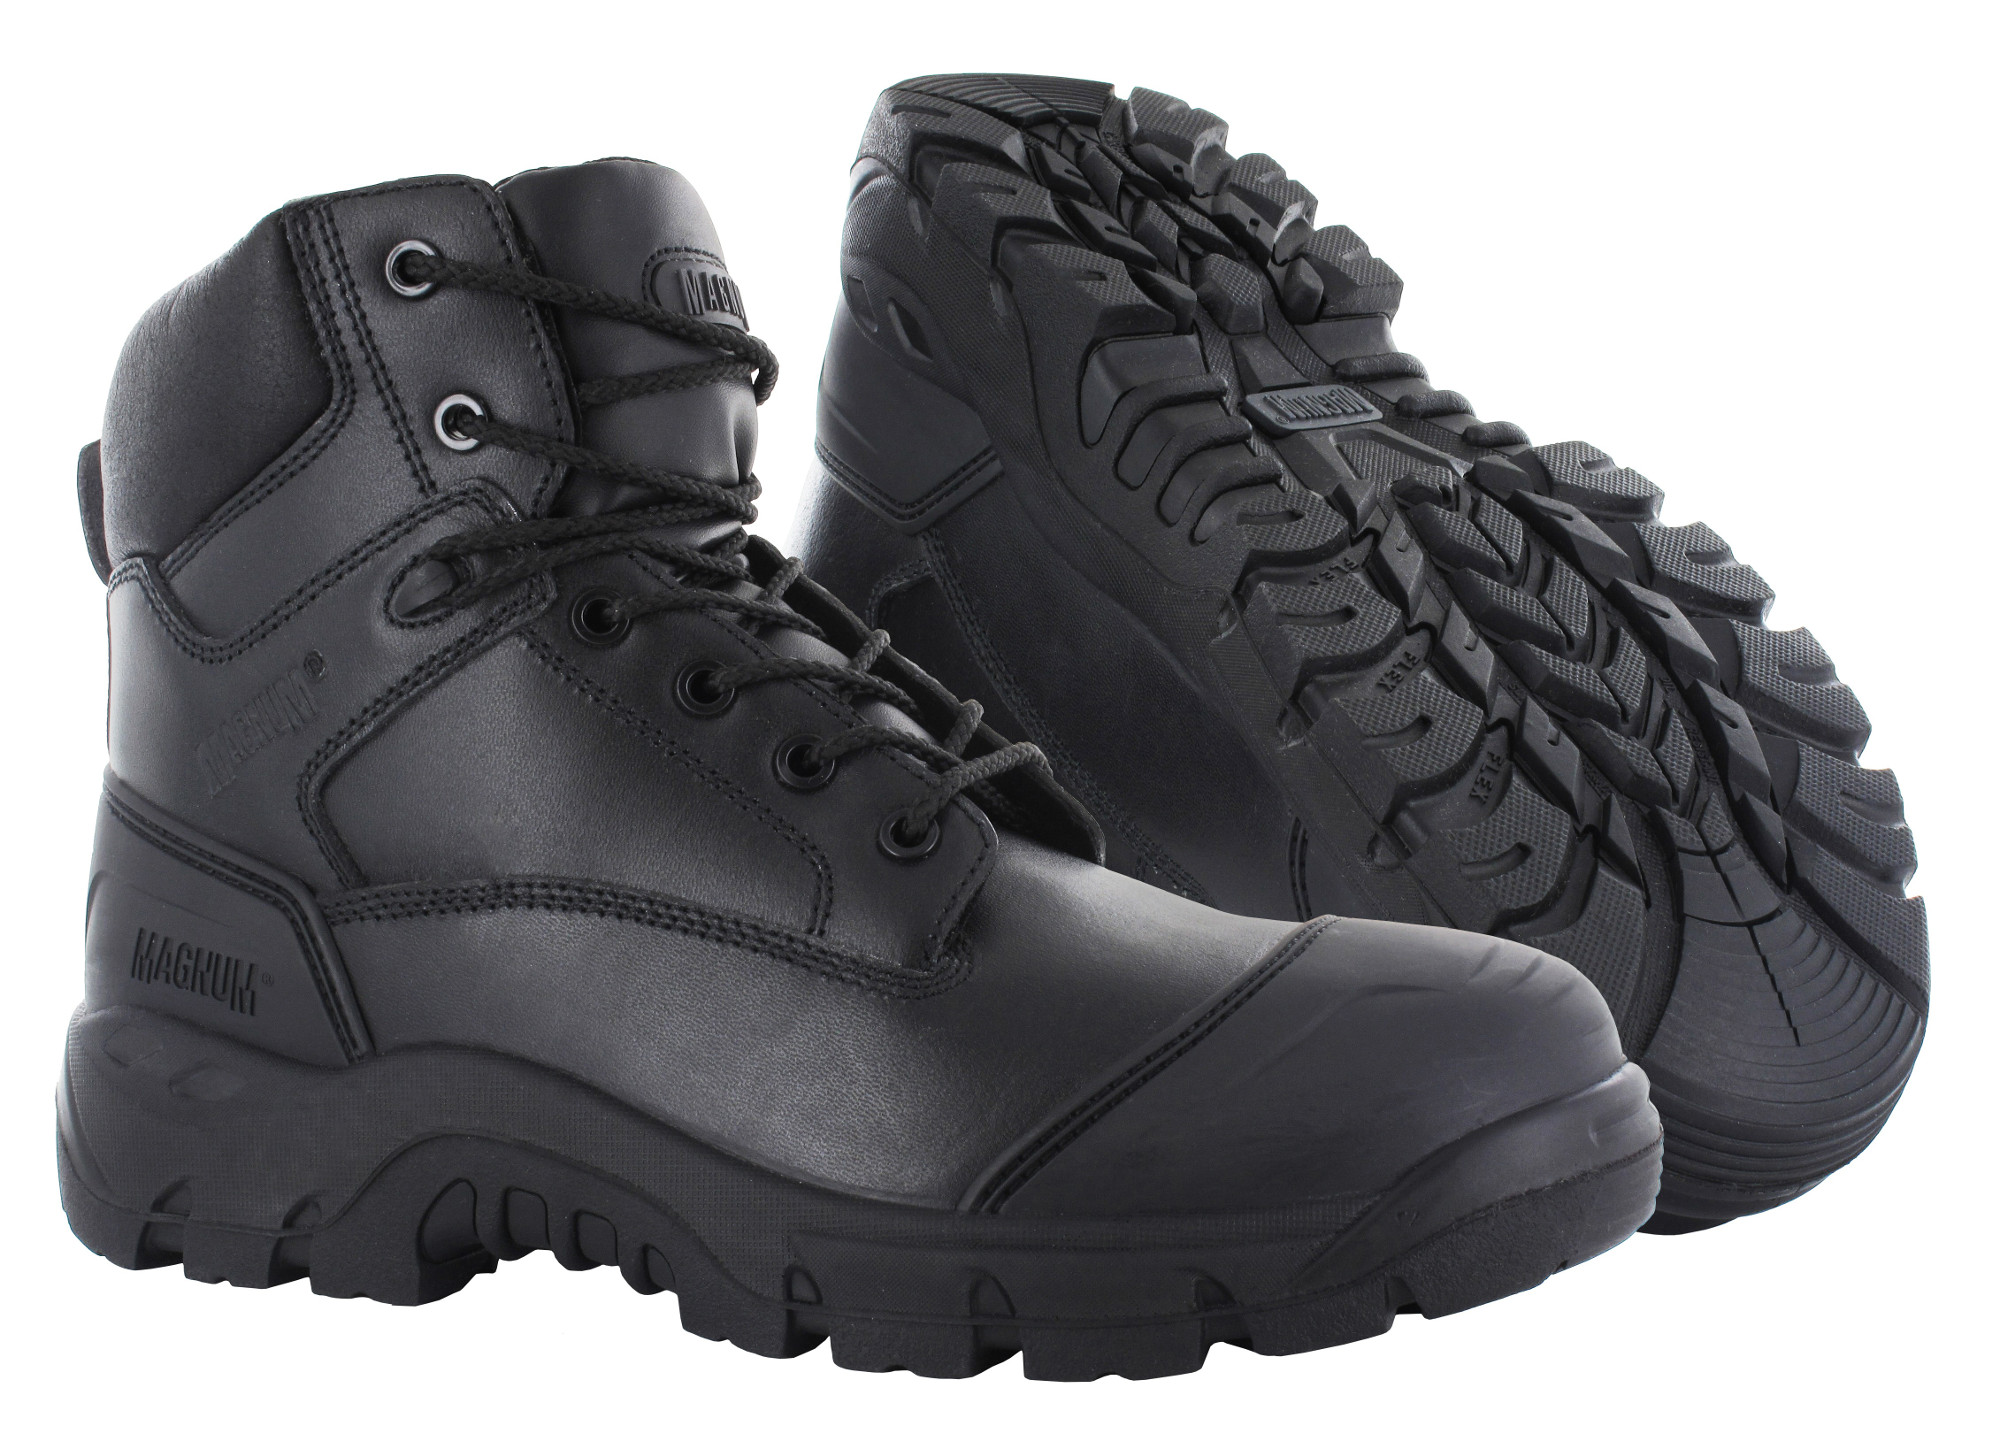 69743da2881 Magnum Roadmaster Black Composite Toe Cap Full Grain Leather S3 Safety Boots